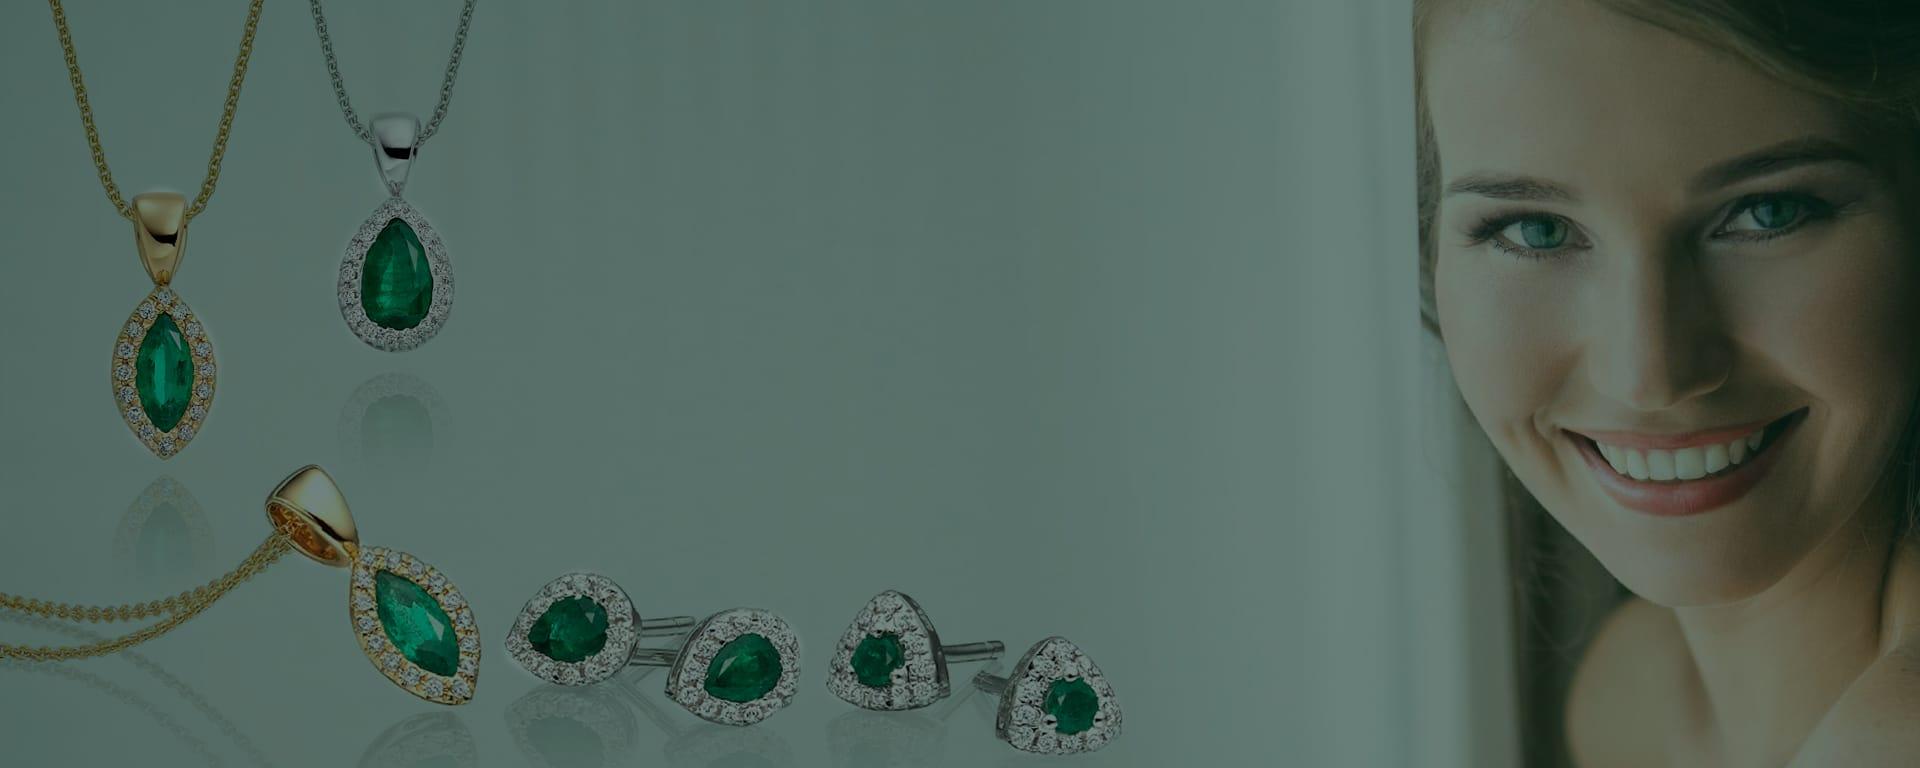 EMERALD JEWELLERYNatures most beautiful gem...